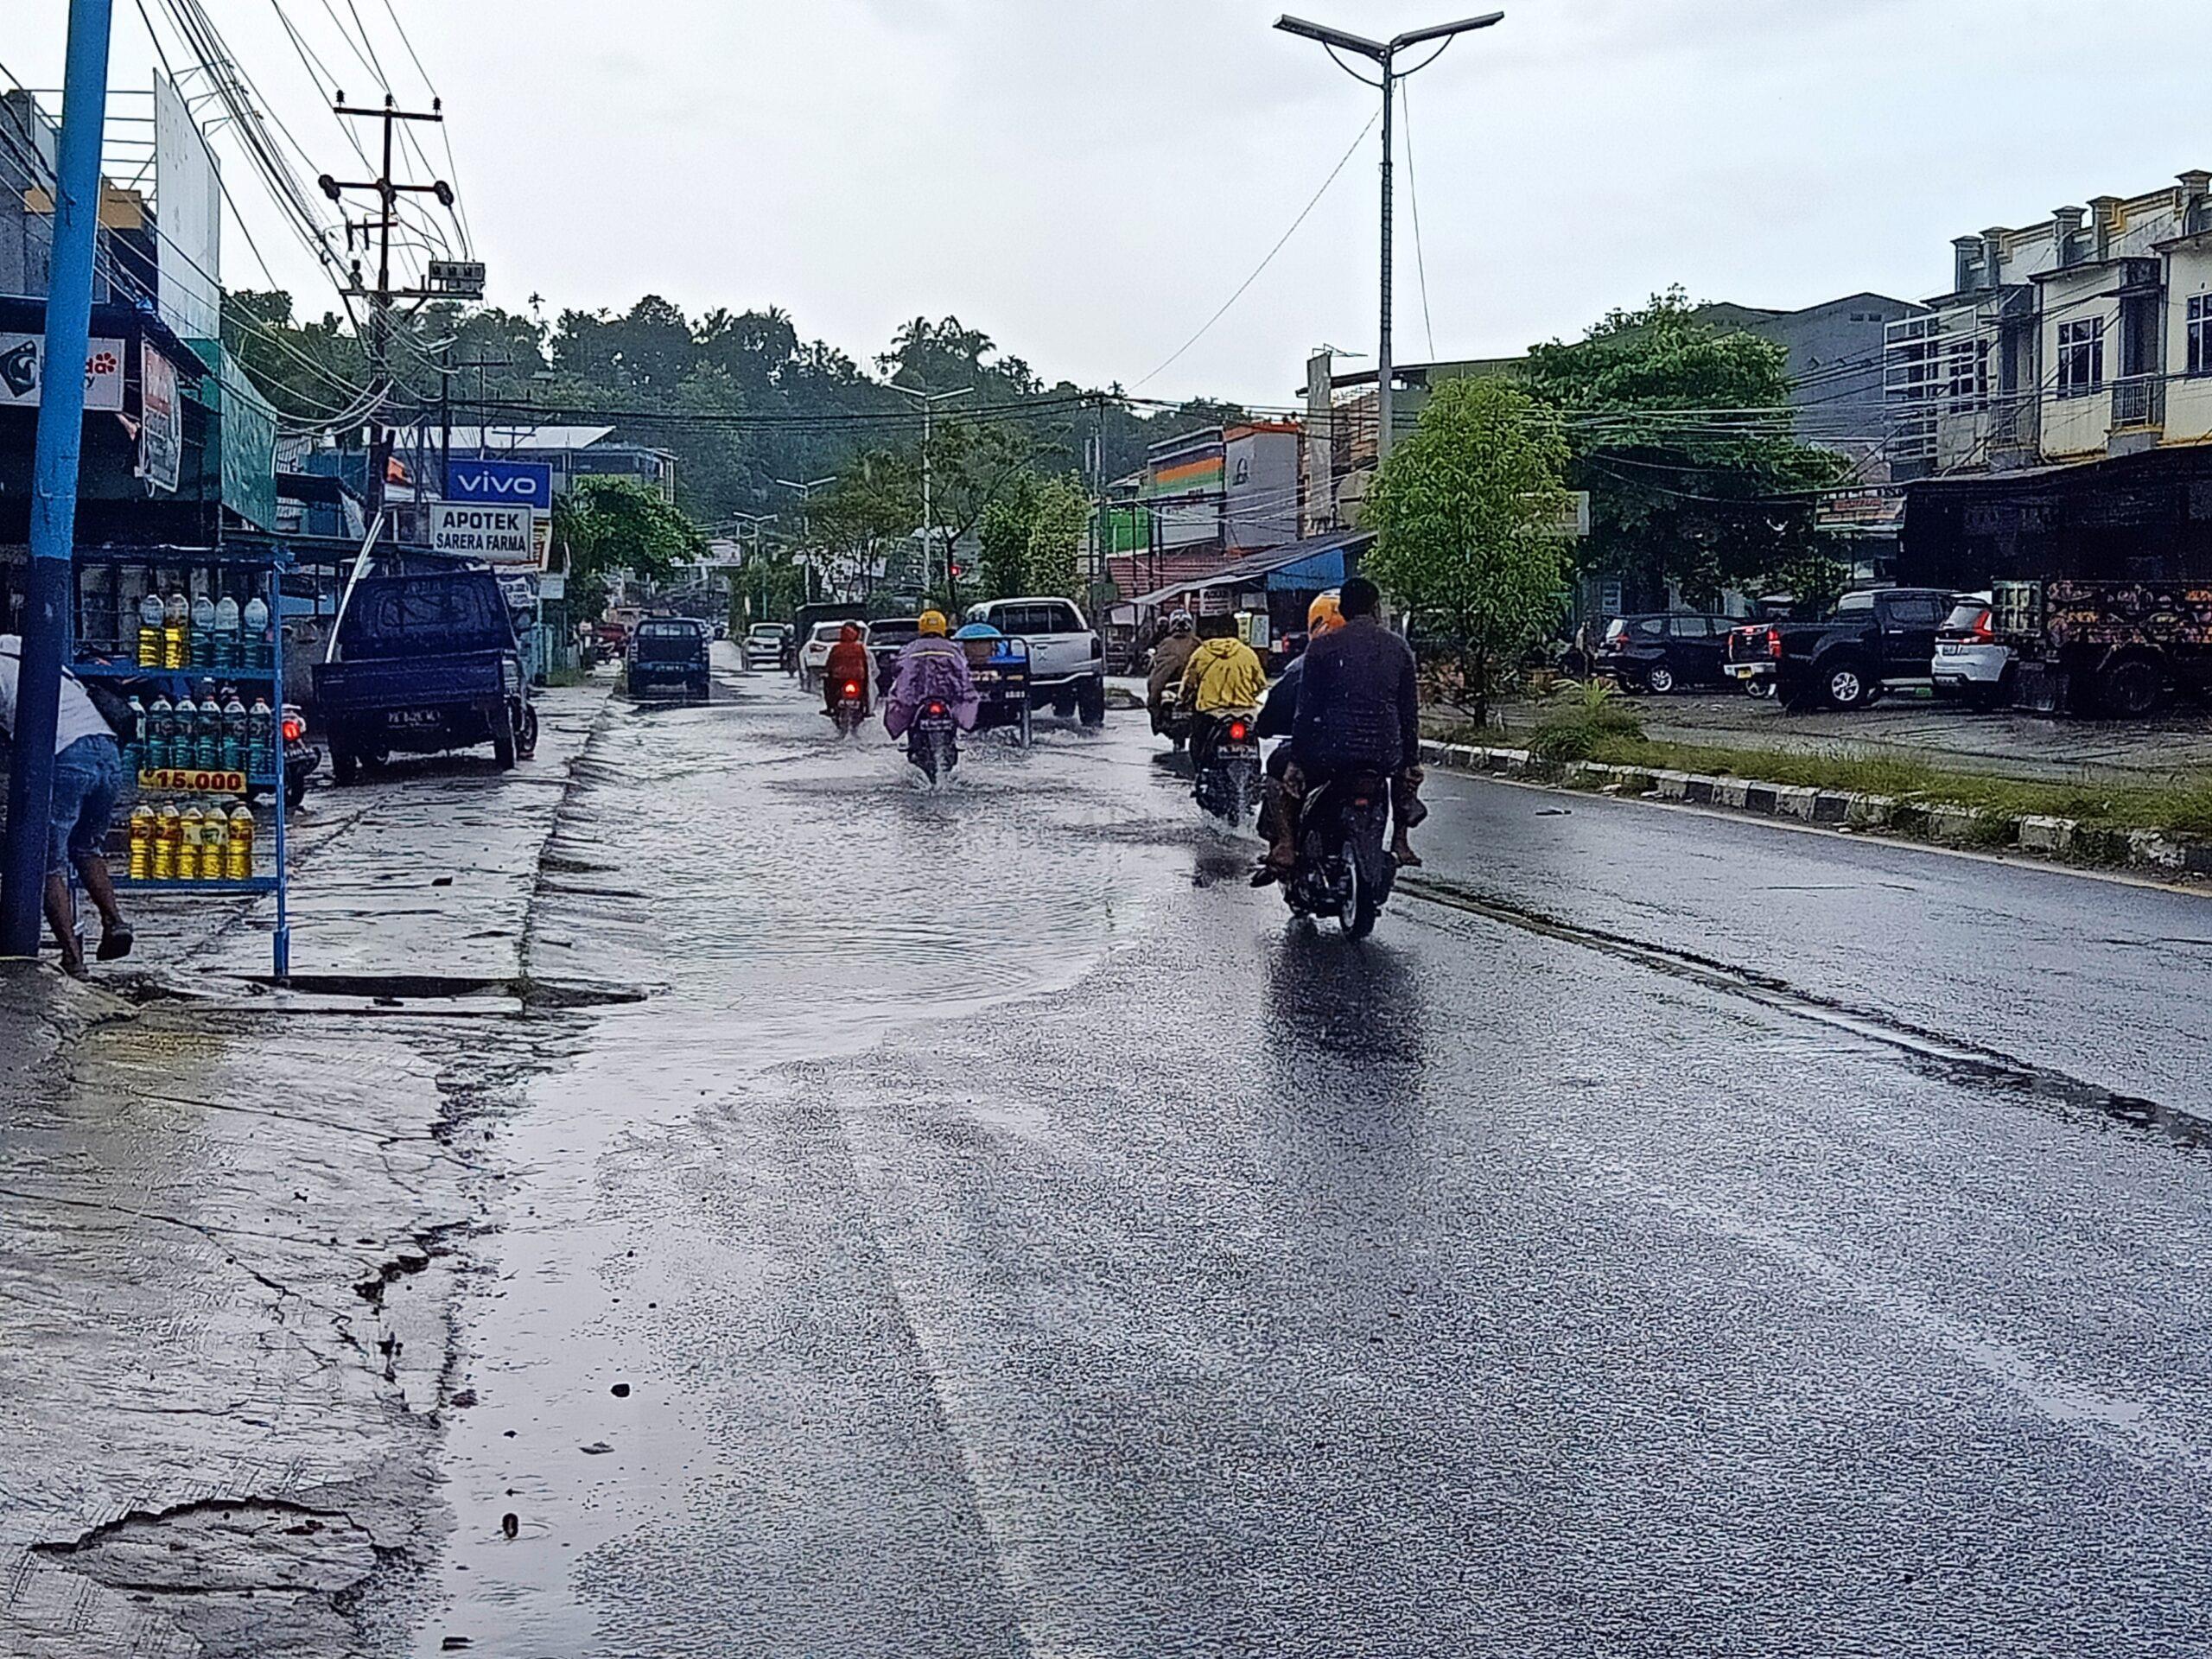 Manokwari Hujan Deras Disertai Petir dan Guntur 1 IMG 20210206 153513 scaled